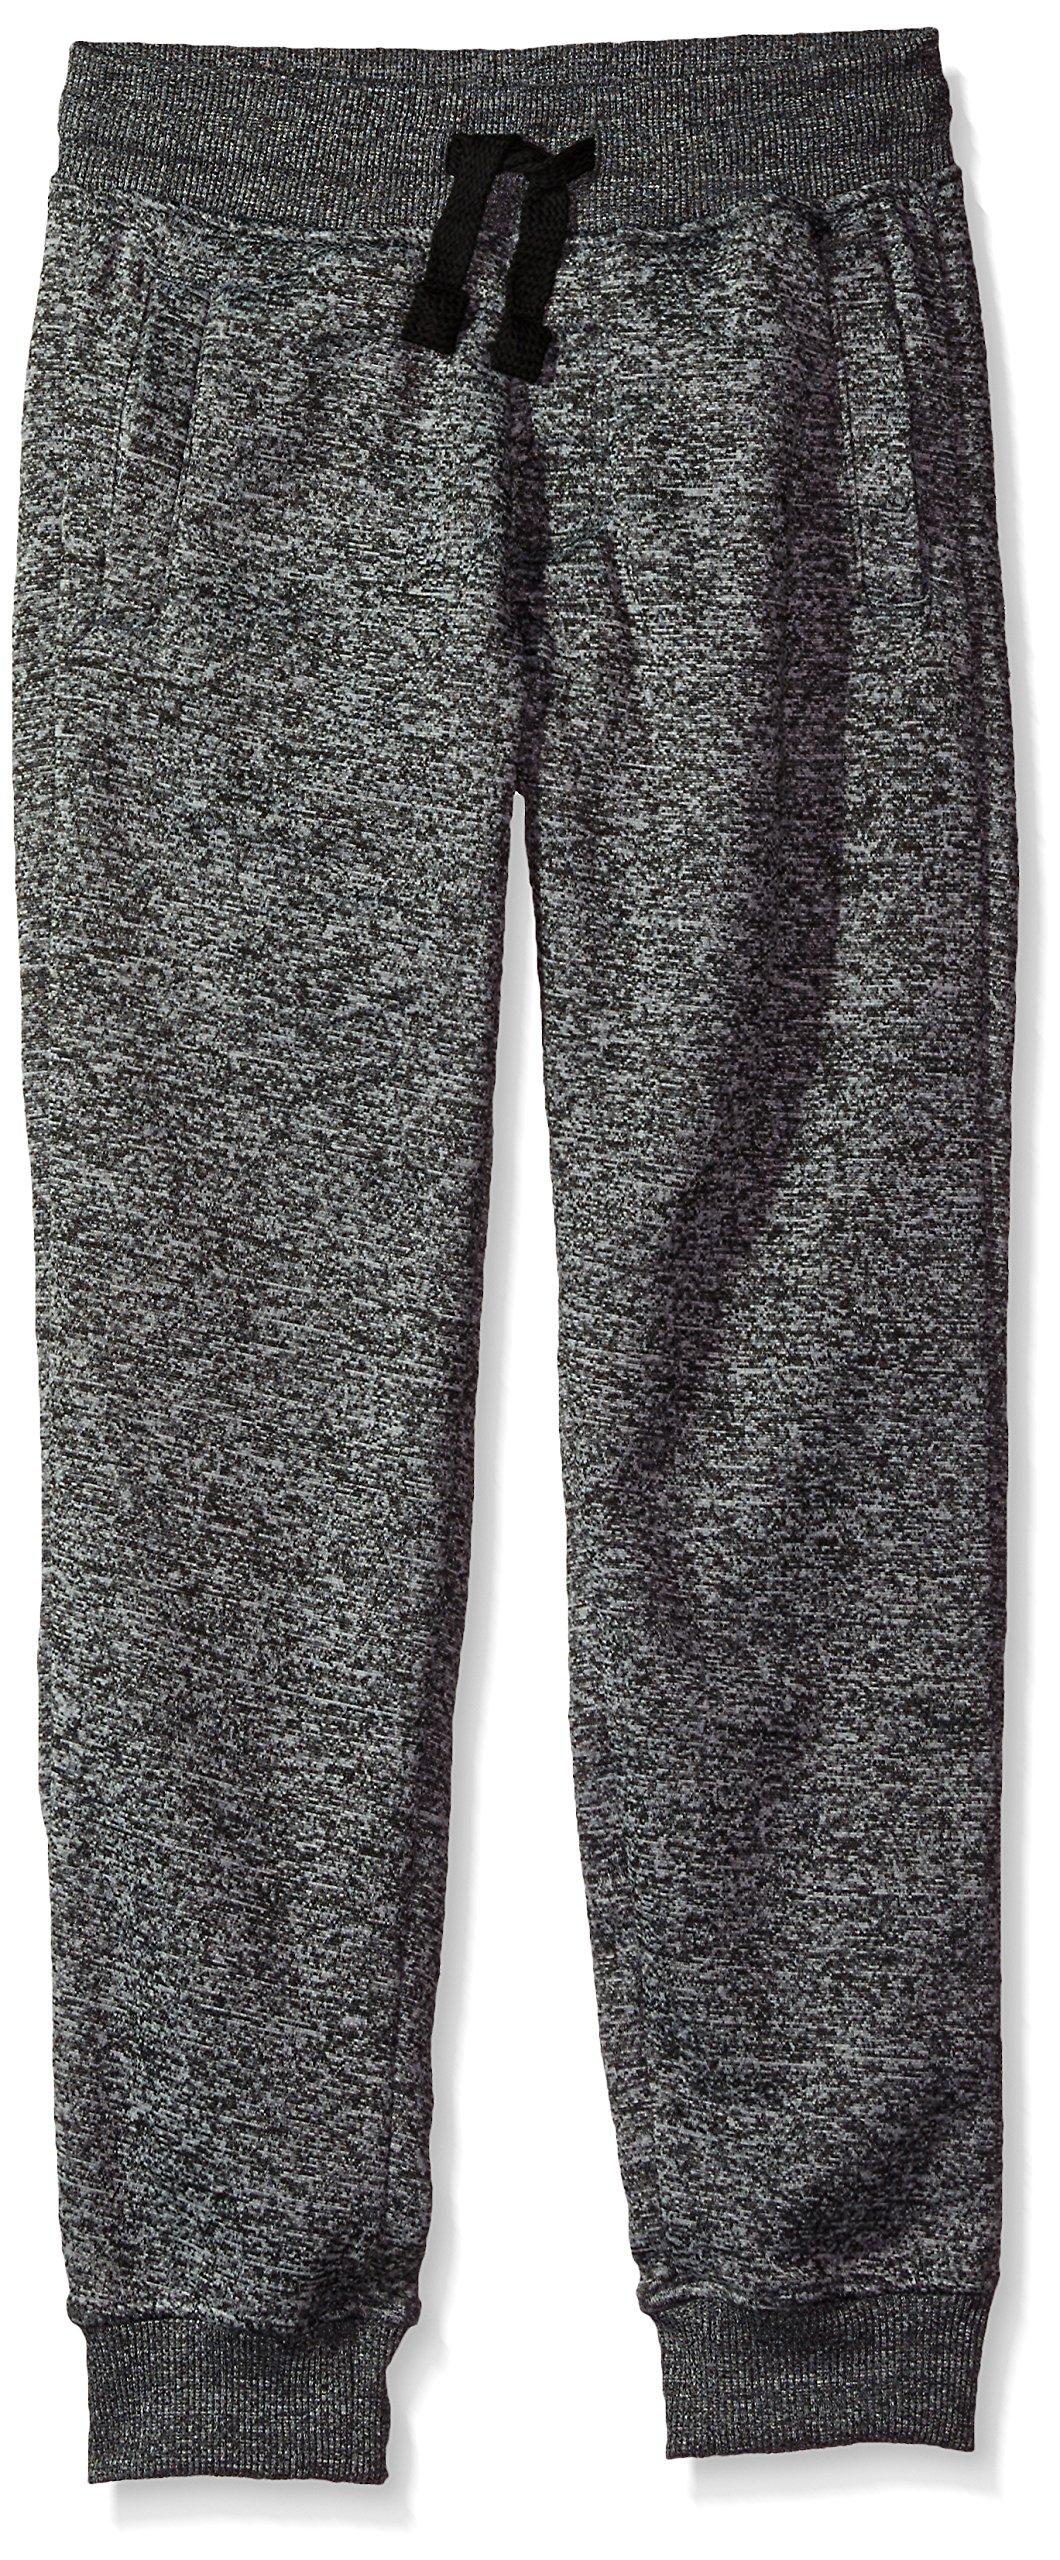 Southpole Big Boys' Jogger Fleece Pants in Basic Colors, Marled Grey(New/Logo Patch), Medium